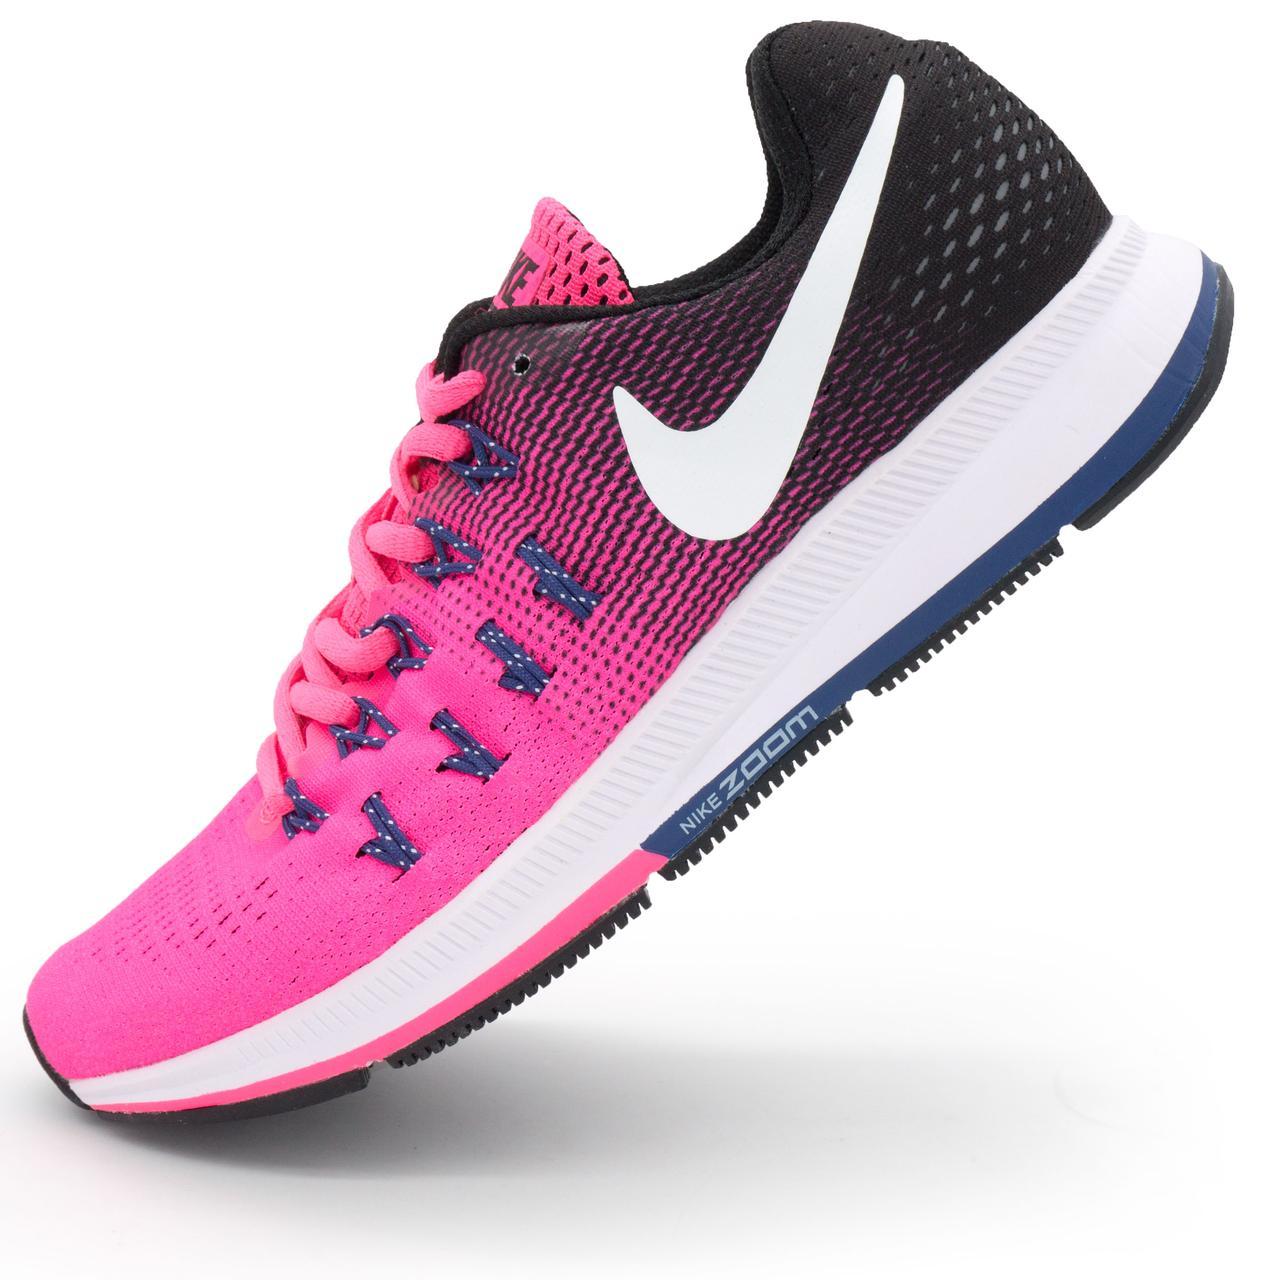 0ca6ae8c Женские кроссовки для бега Nike Zoom Pegasus 33 Розовые. Топ качество! р.(